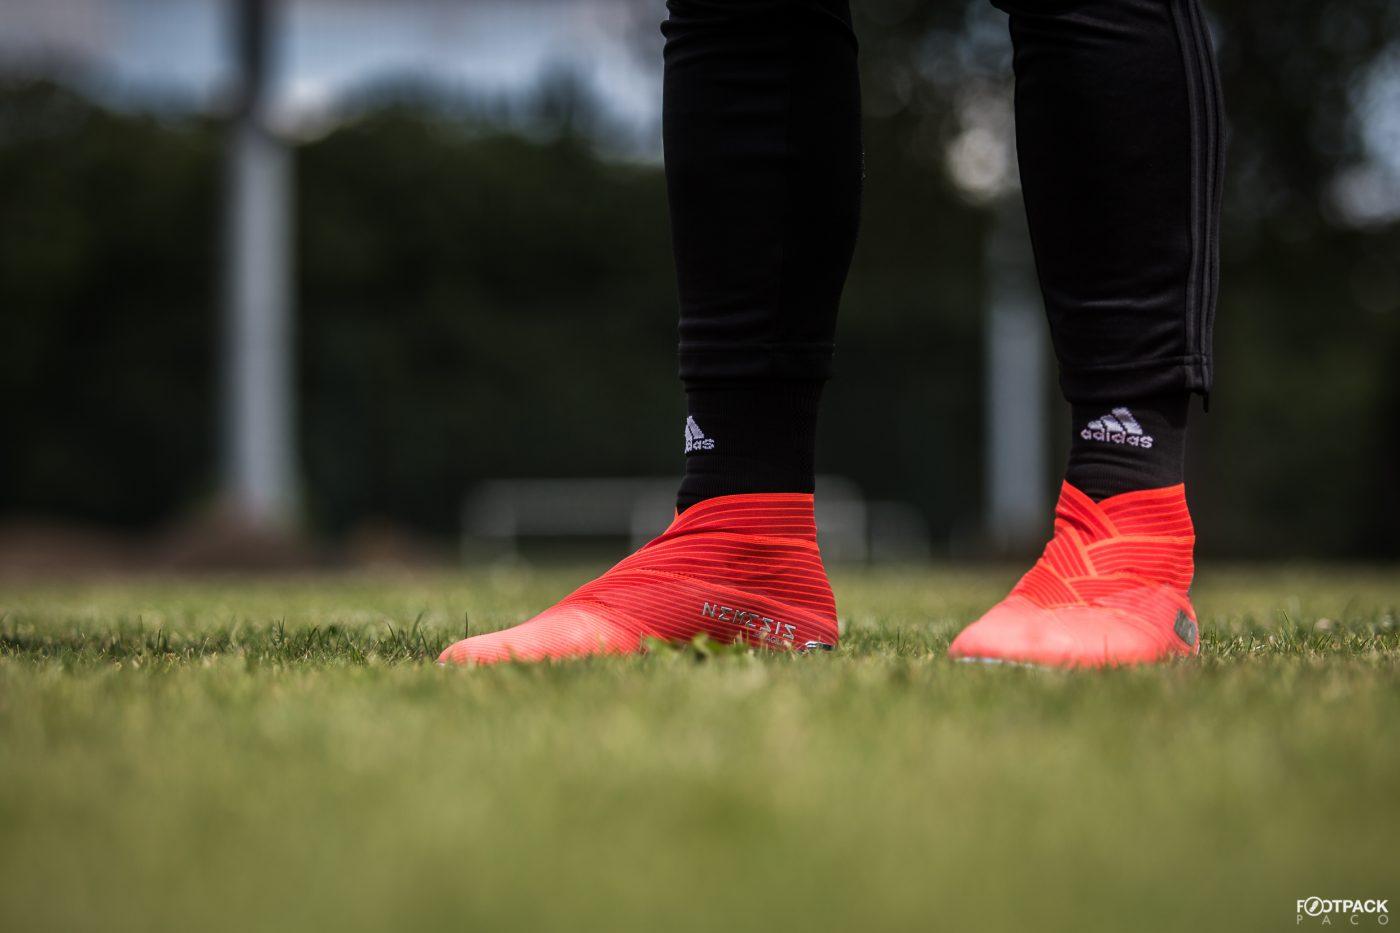 test-adidas-nemeziz-19-footpack-juin-2019-6test-adidas-nemeziz-19-footpack-juin-2019-6